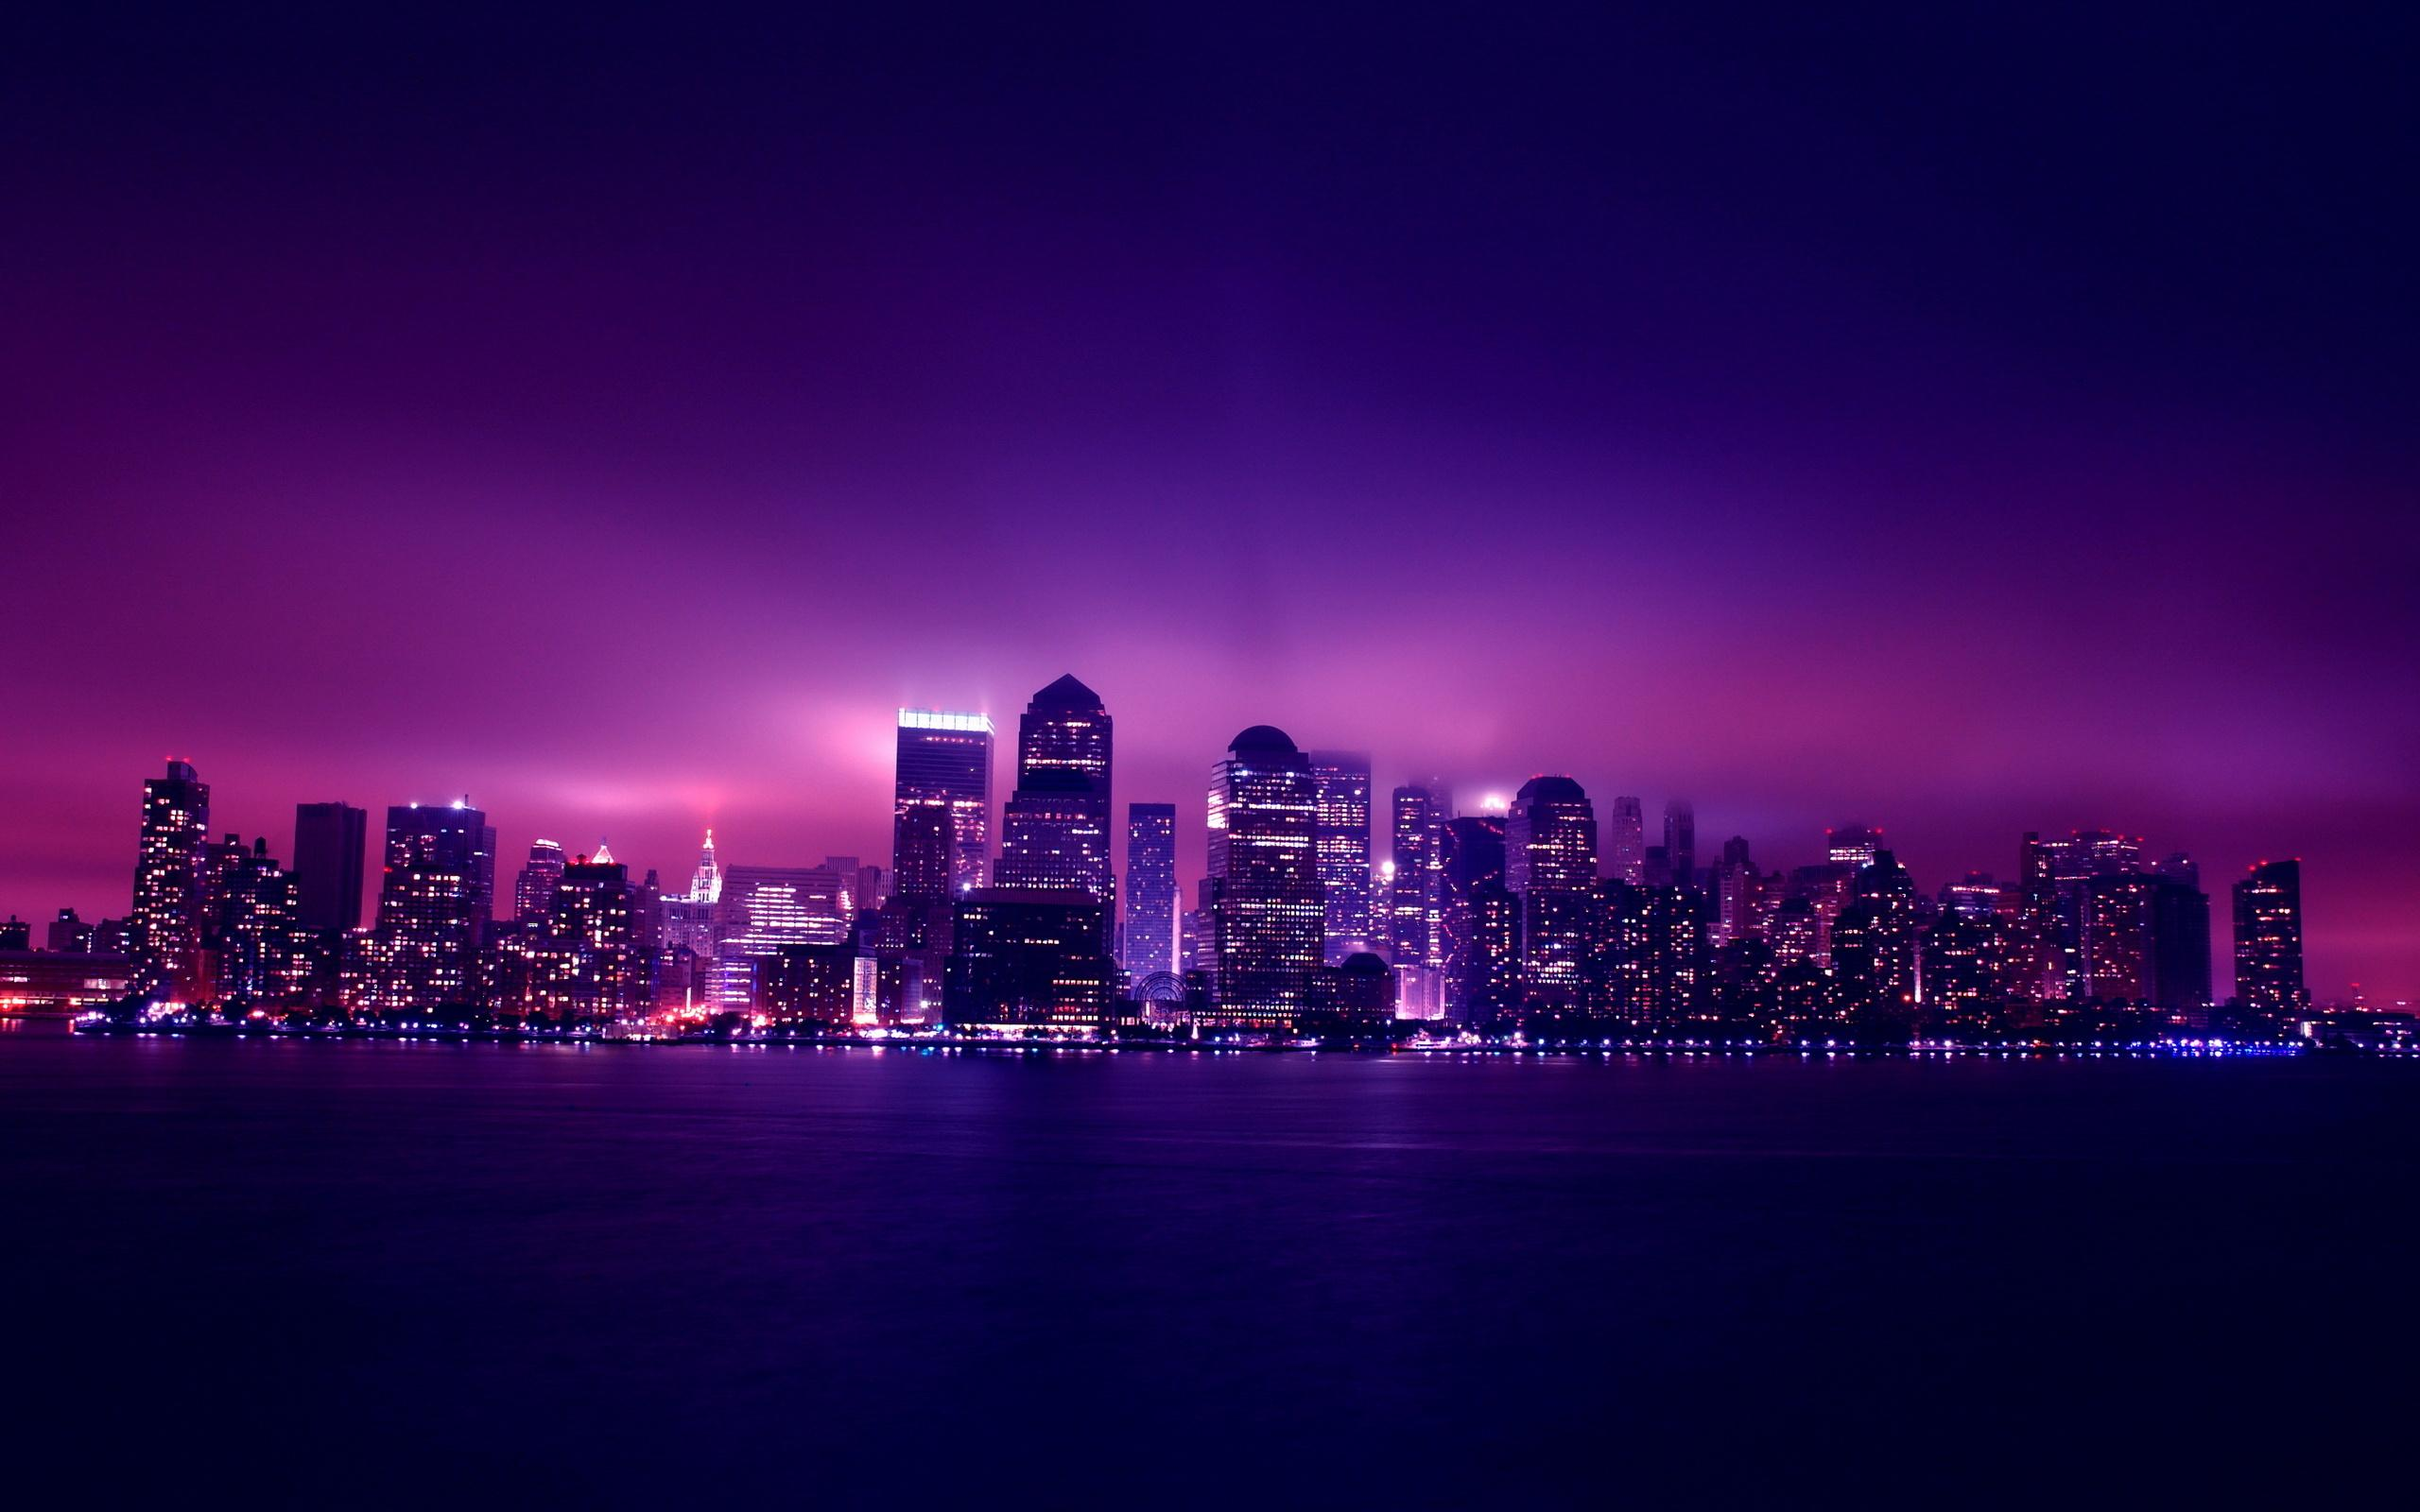 2048x1152 Aesthetic City Night Lights 2048x1152 Resolution ...